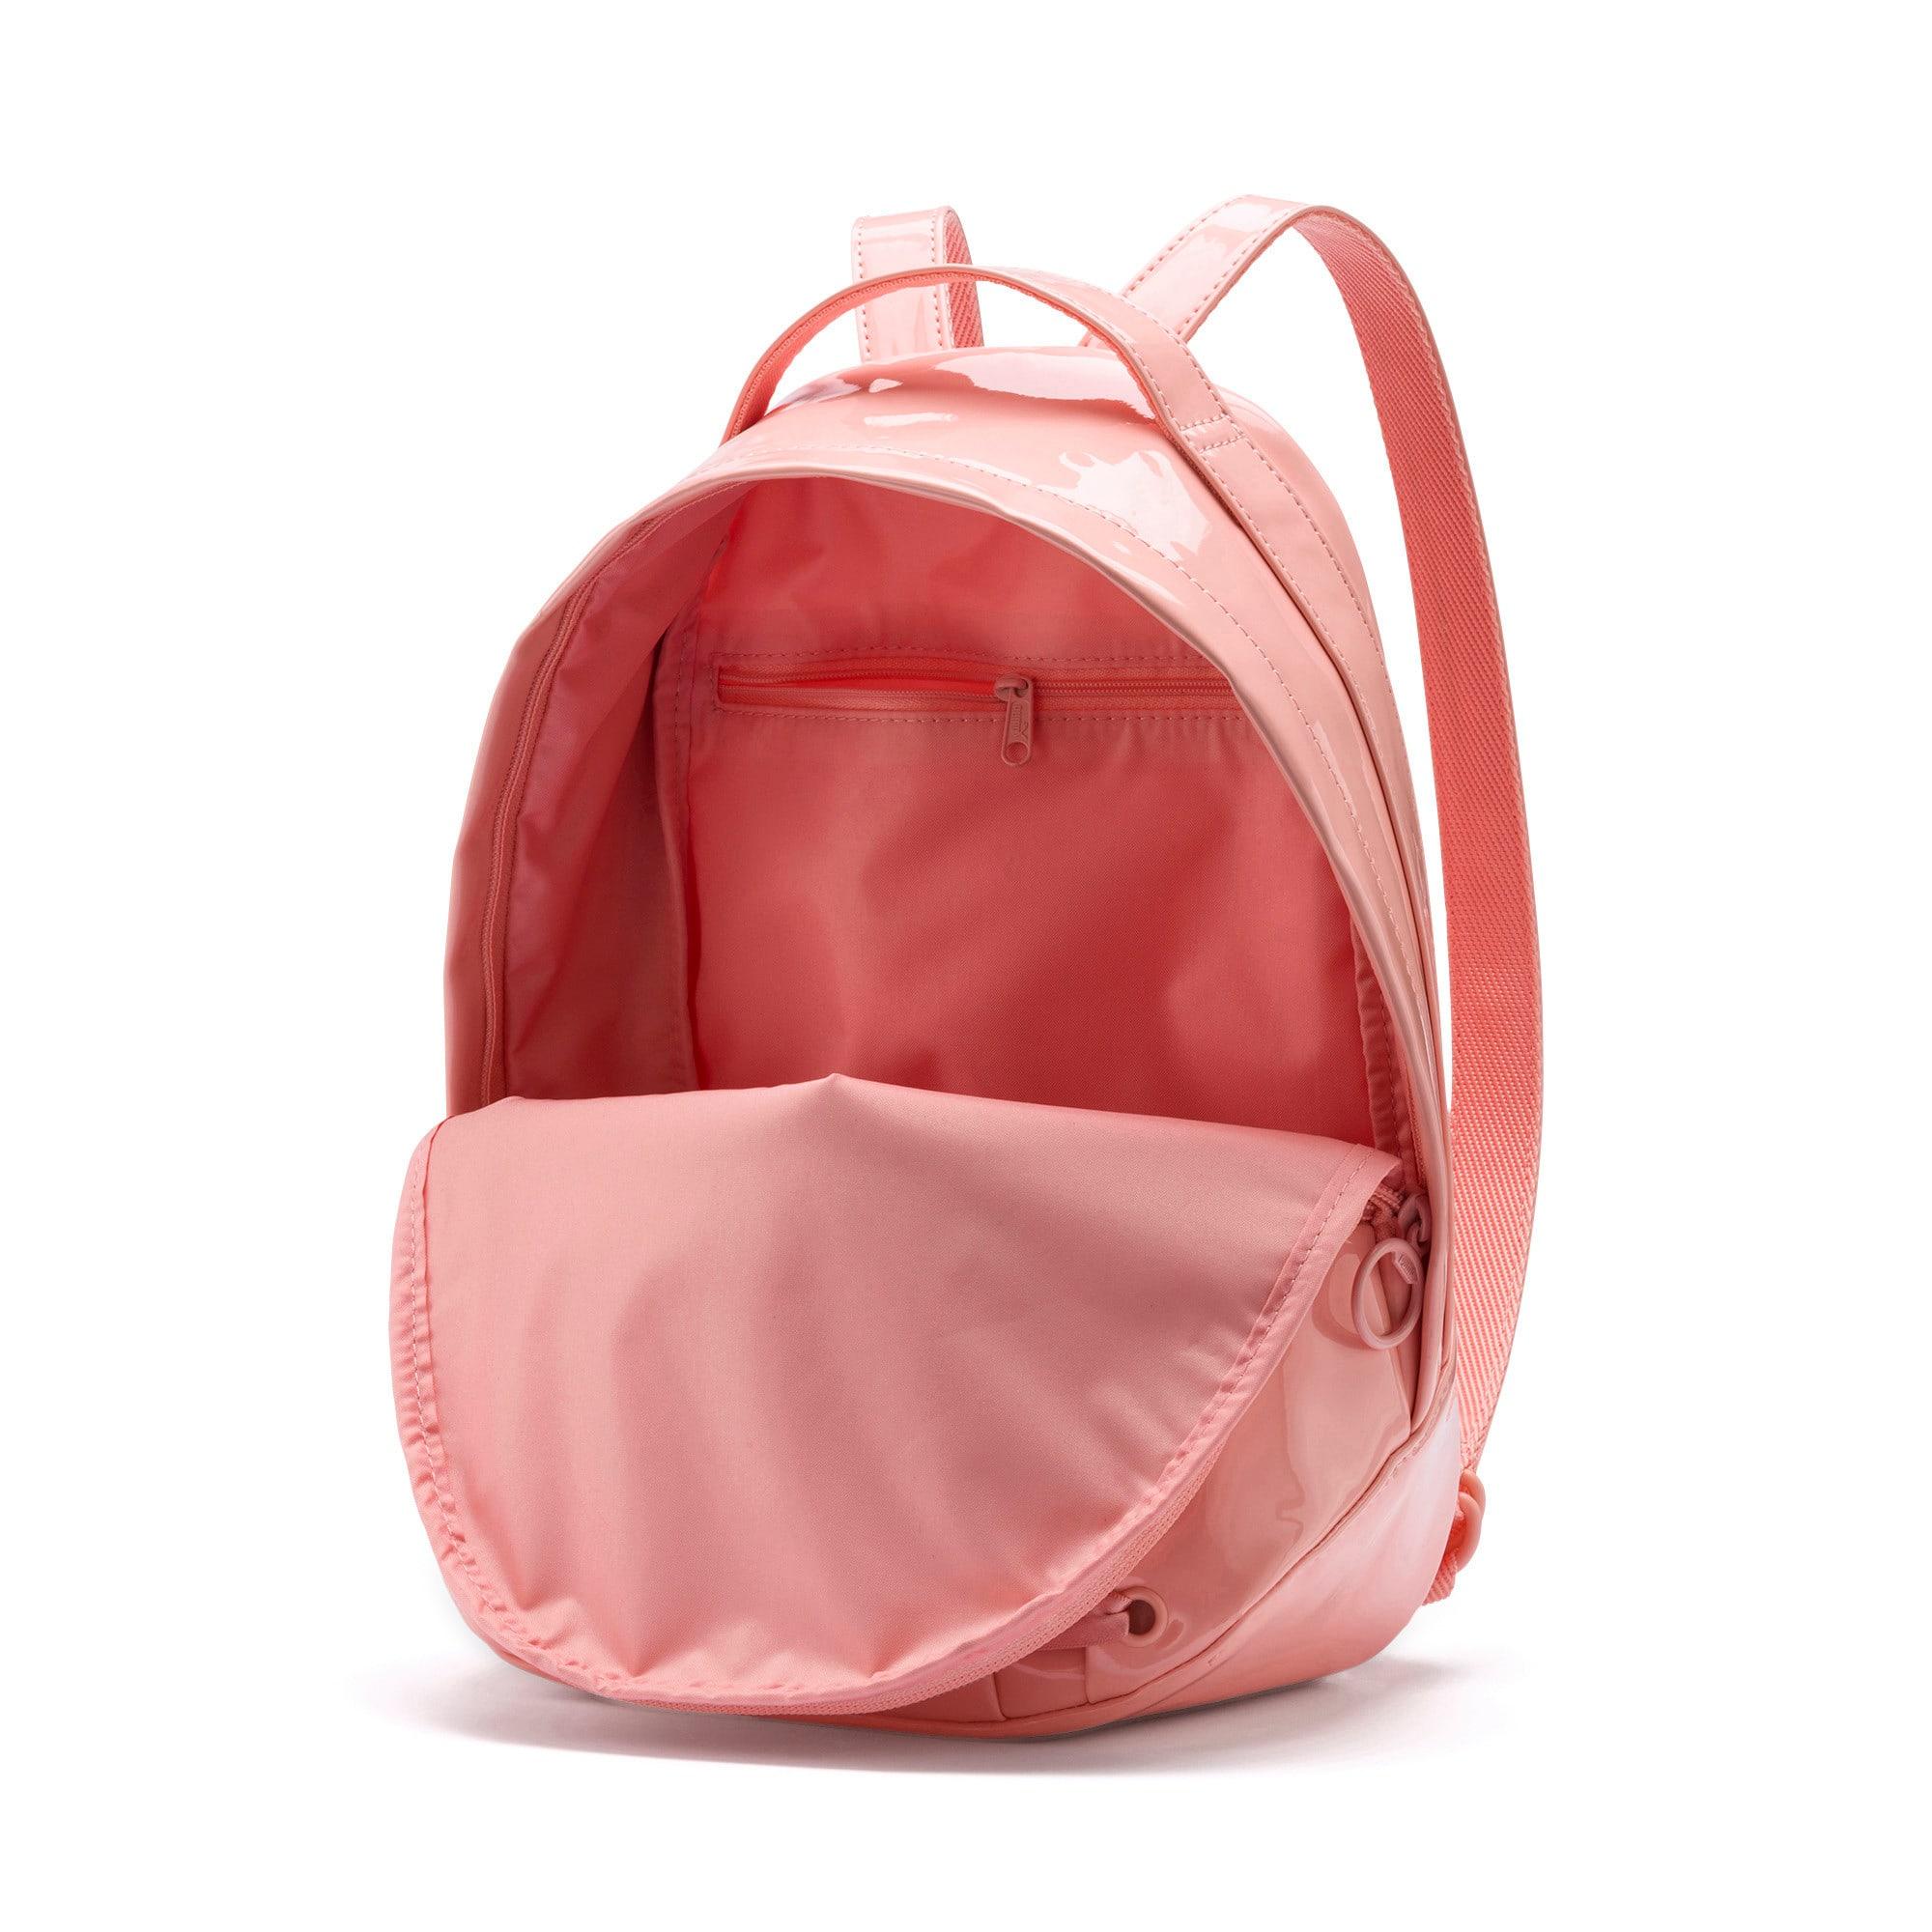 Thumbnail 3 of Prime Archive Crush Women's Backpack, Peach Bud, medium